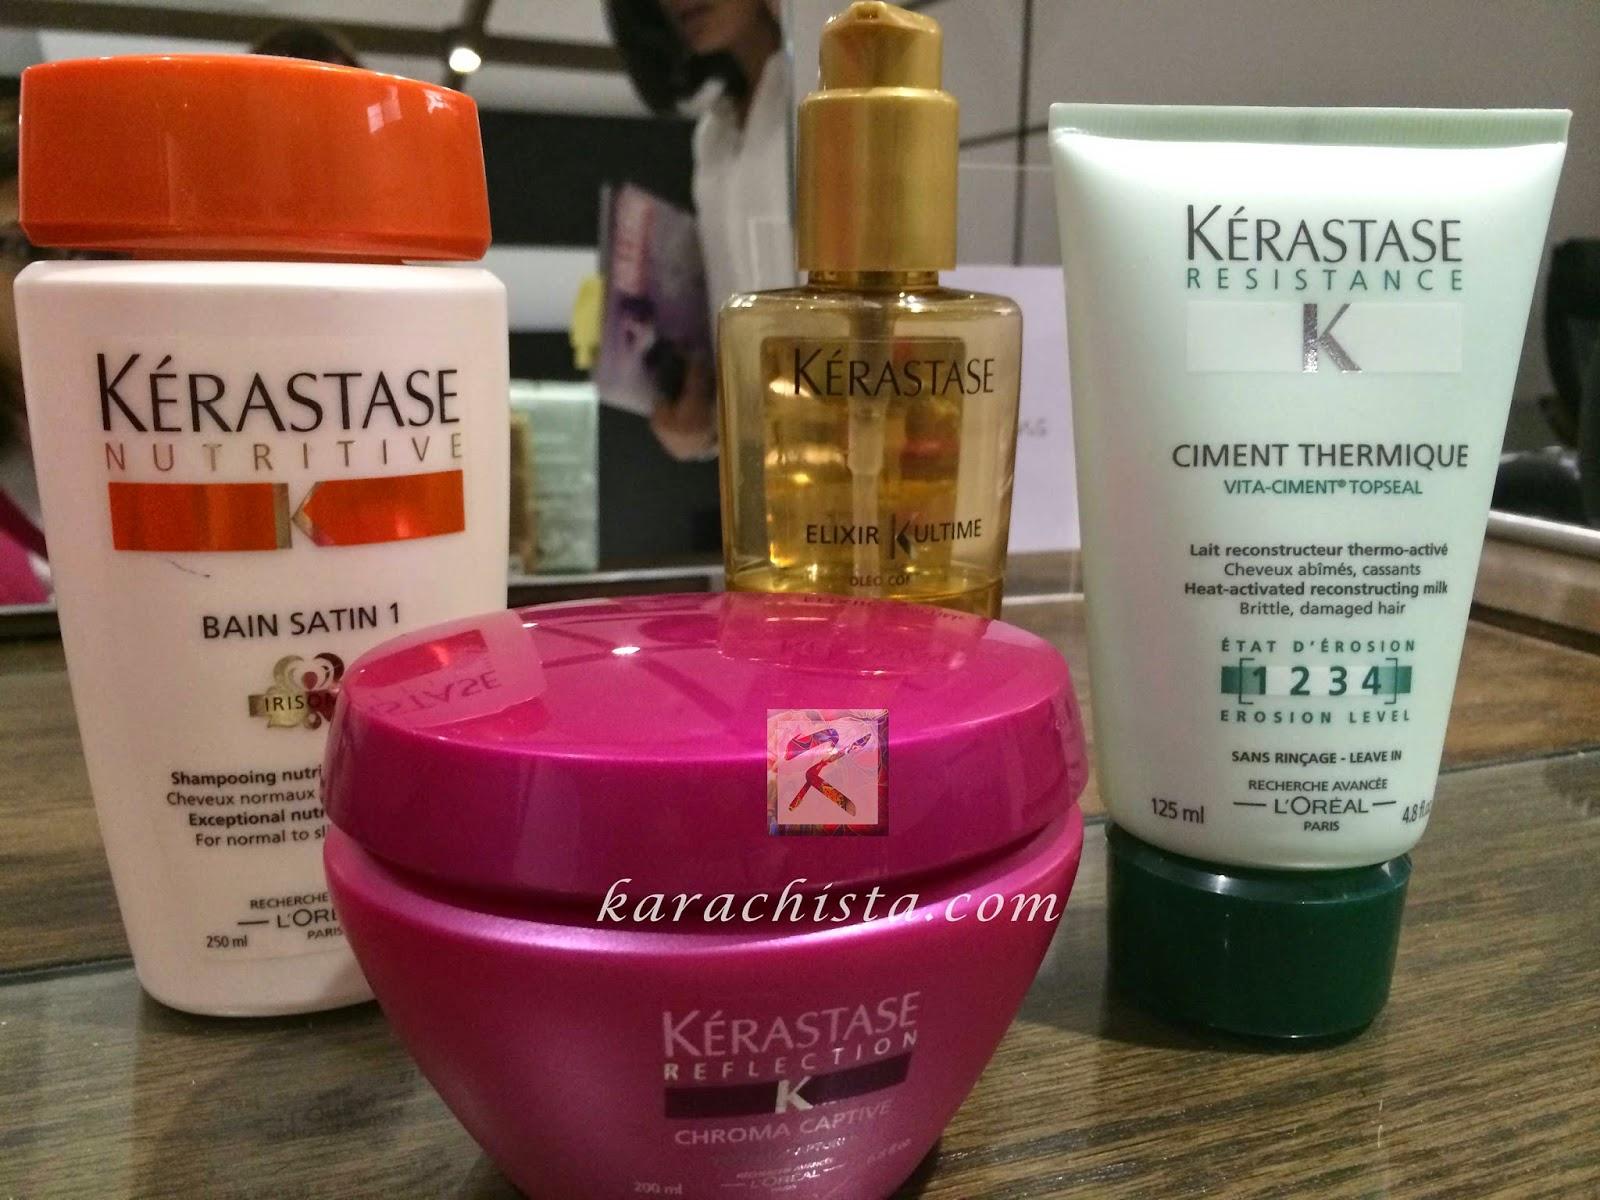 Kerastase treatment for great hair